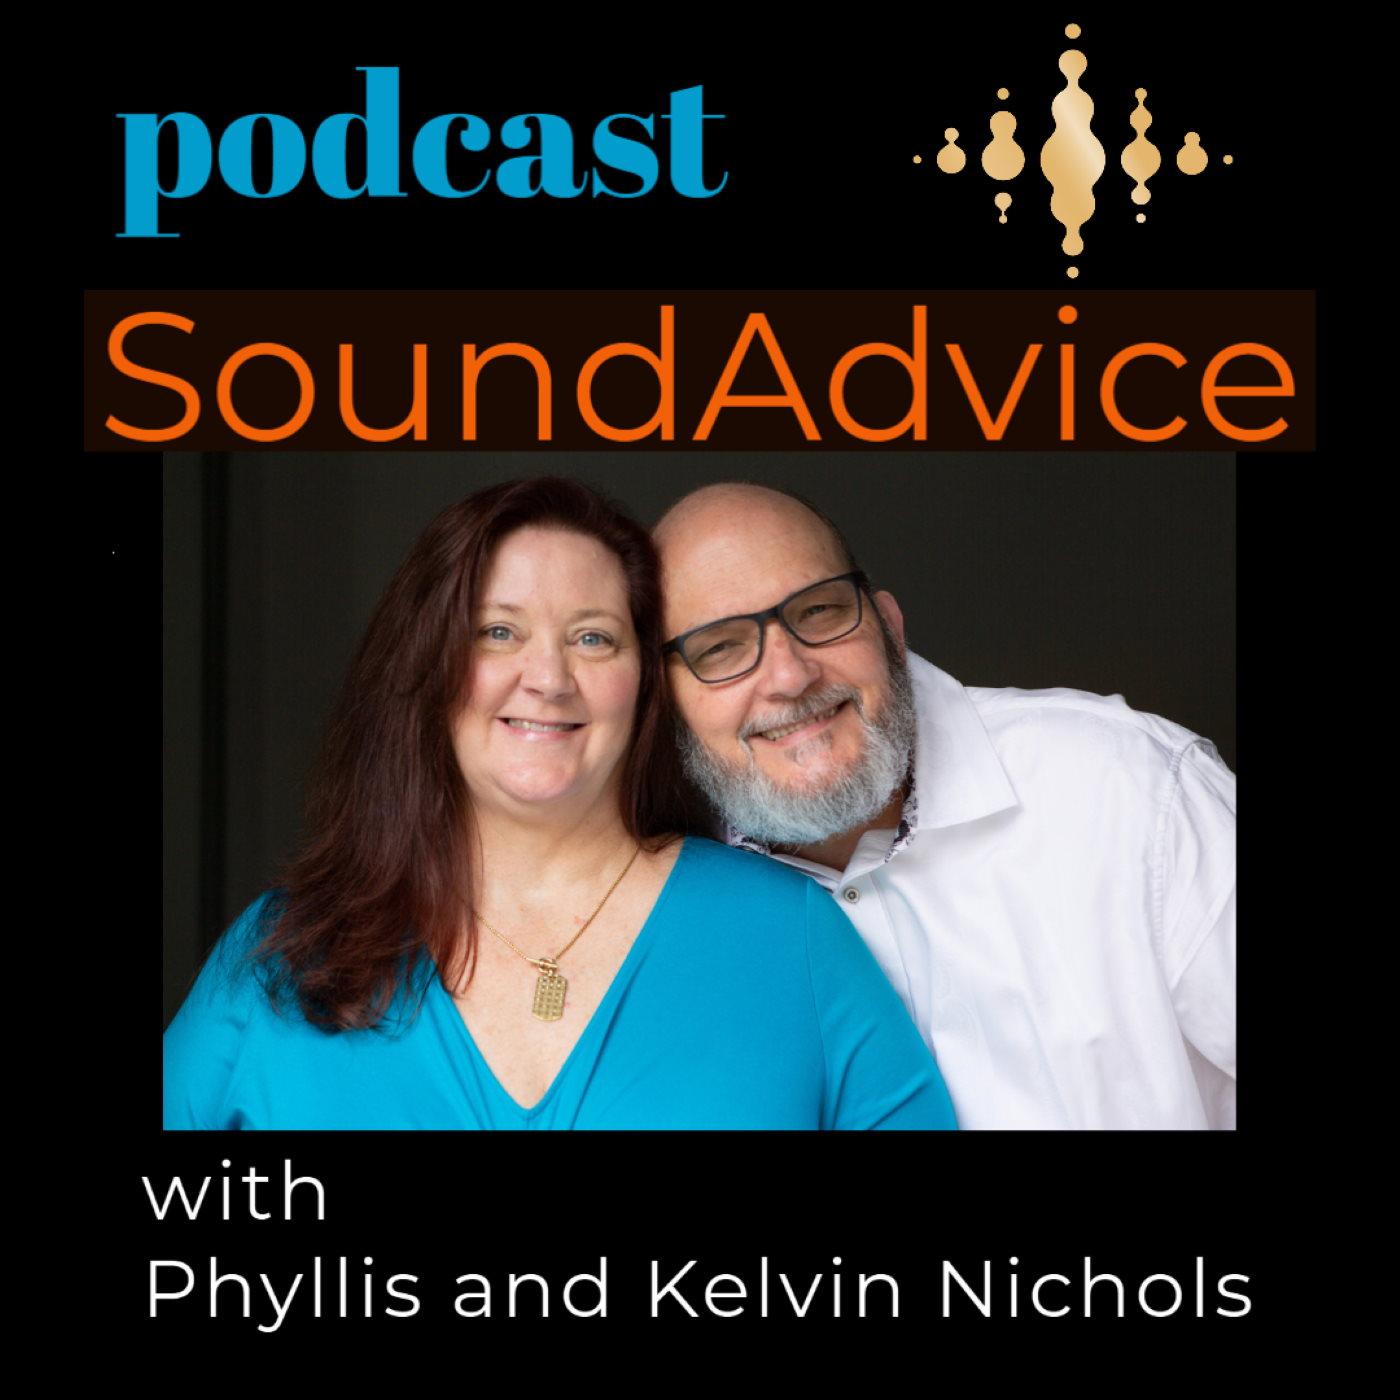 Podcast SoundAdvice with Phyllis and Kelvin Nichols show art